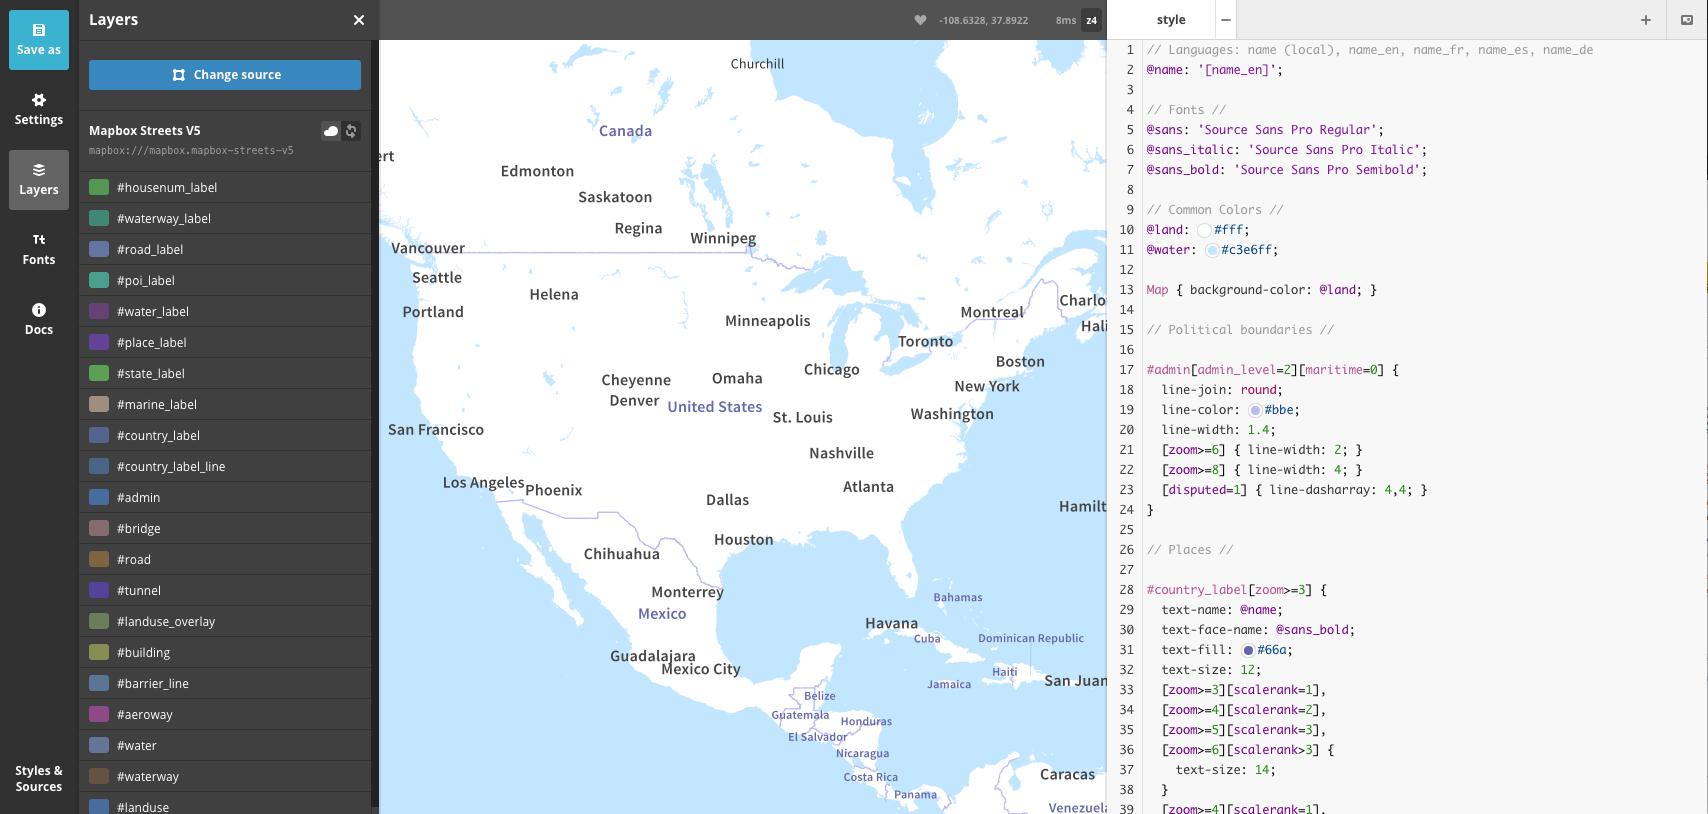 Screenshot 2015-11-17 11.42.27